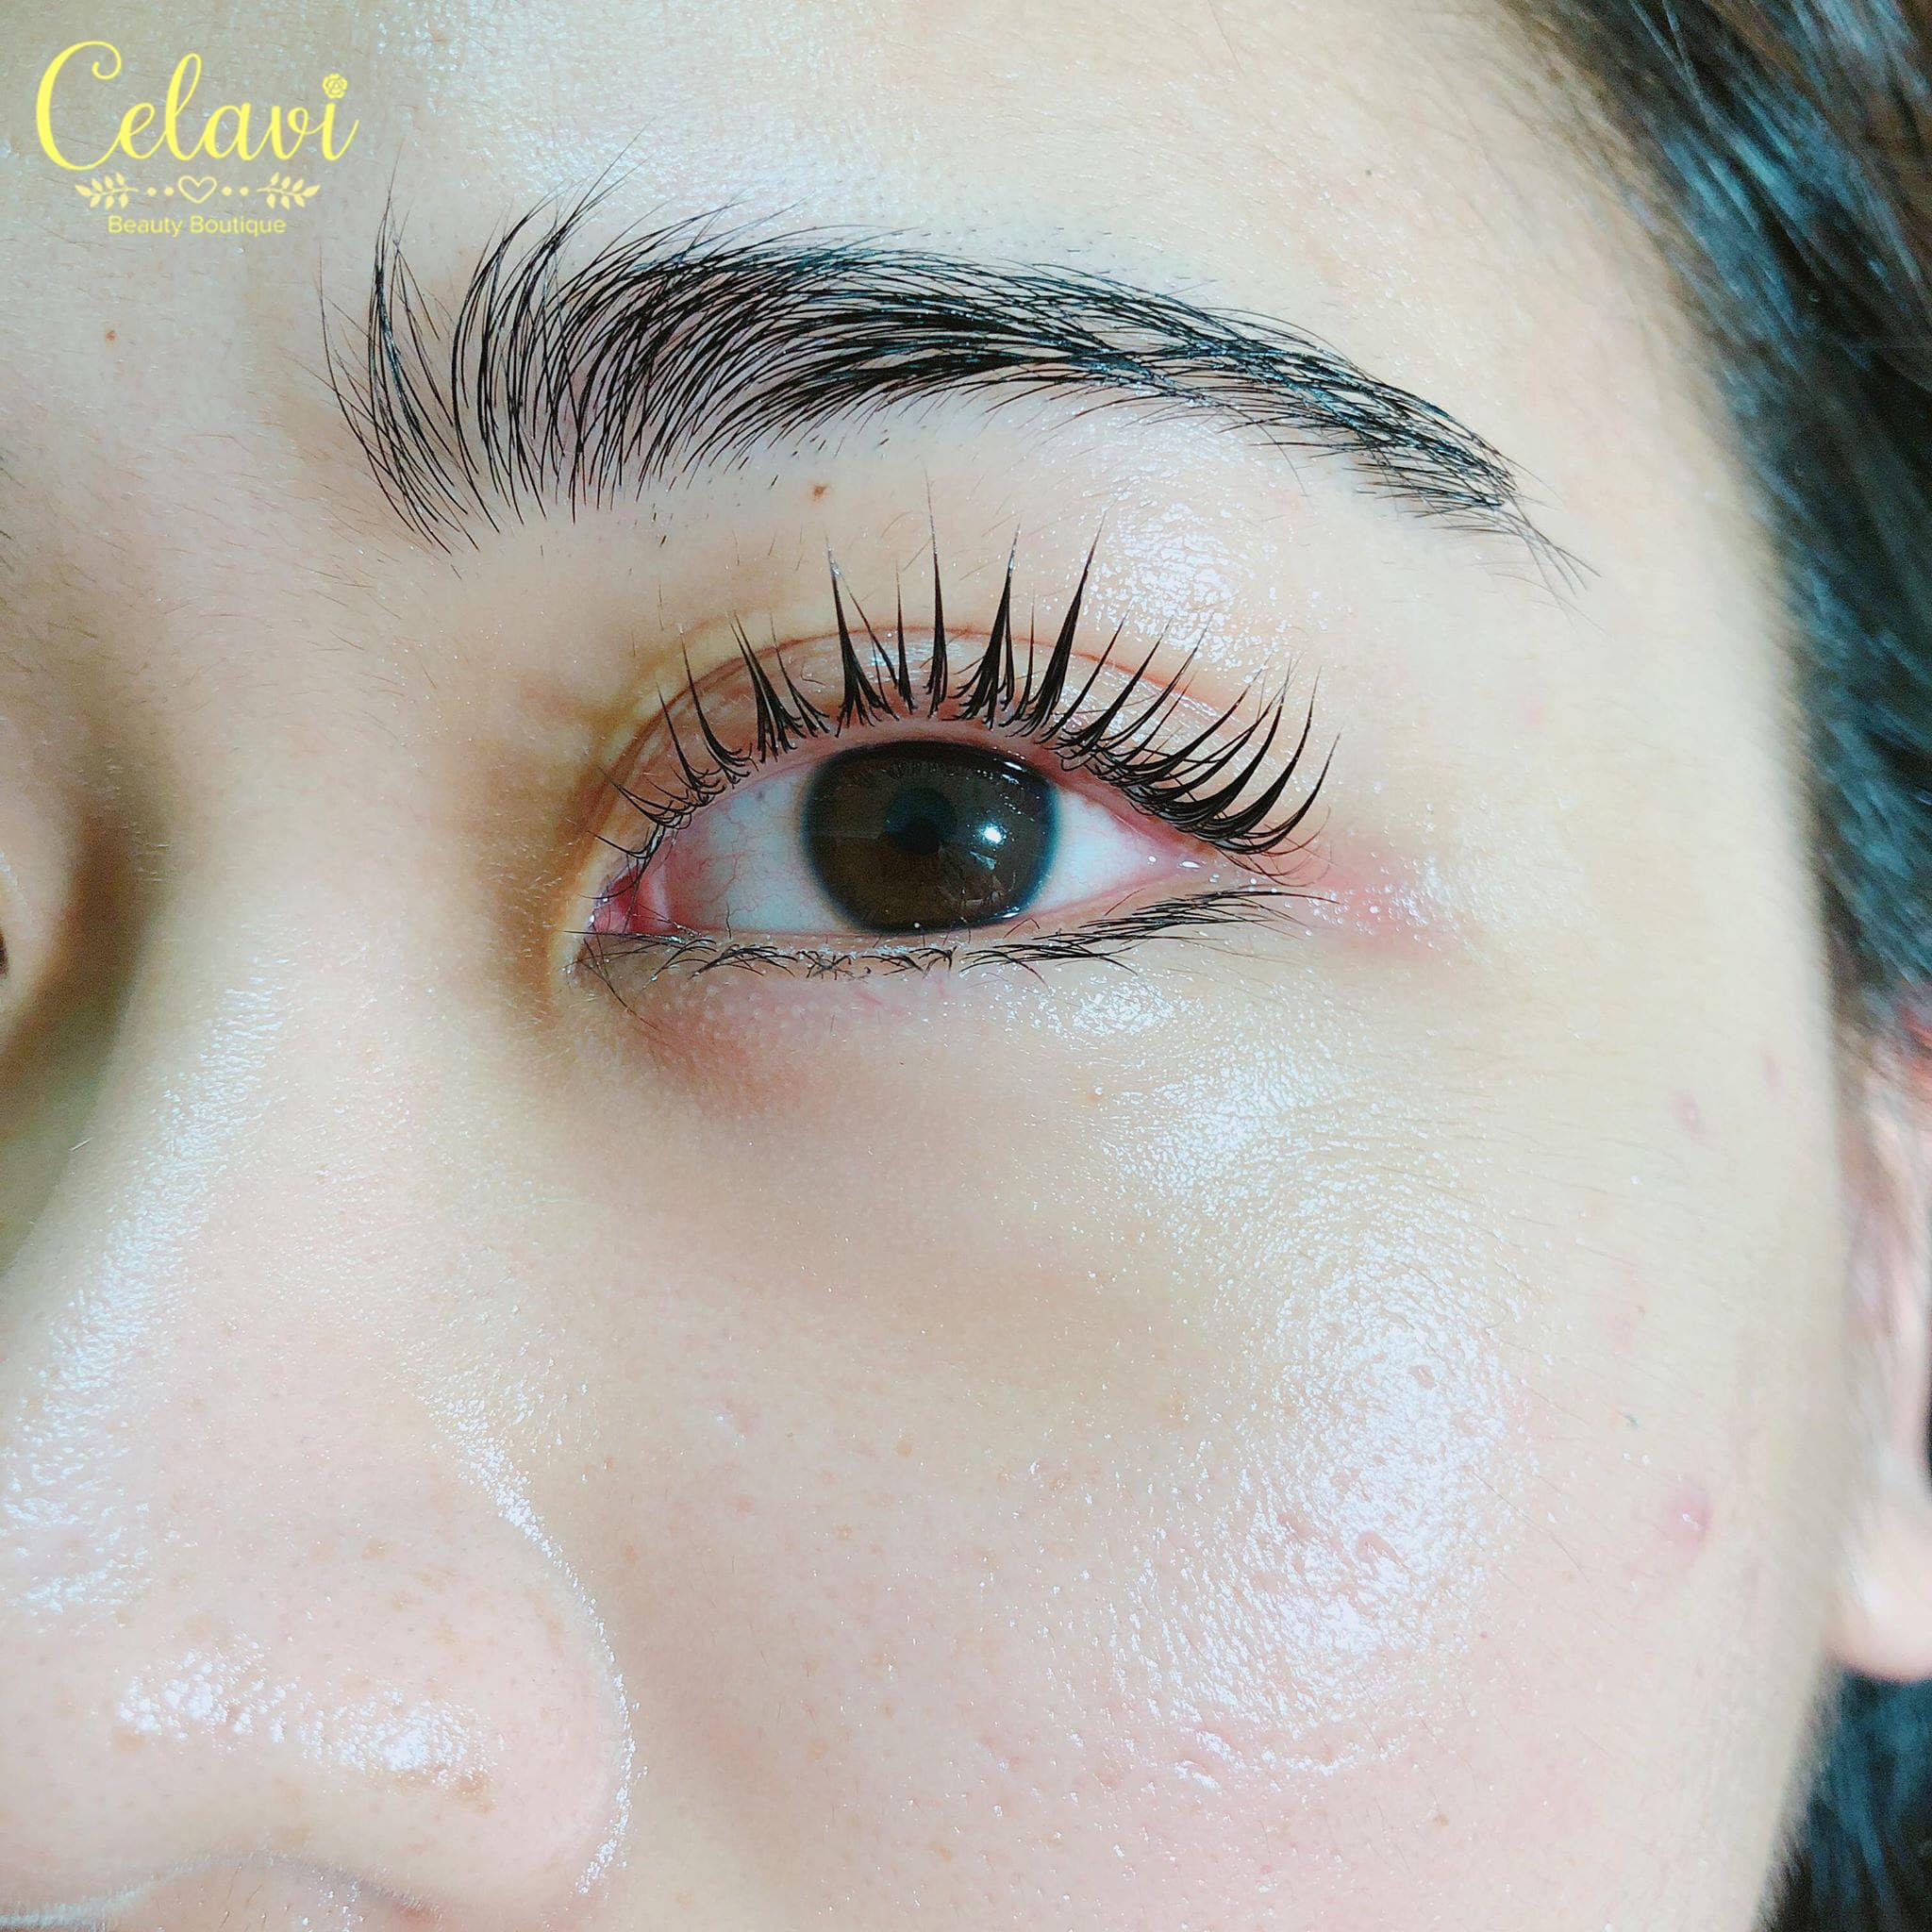 Celavi Beauty - Tiệm Chị Đẹp 1